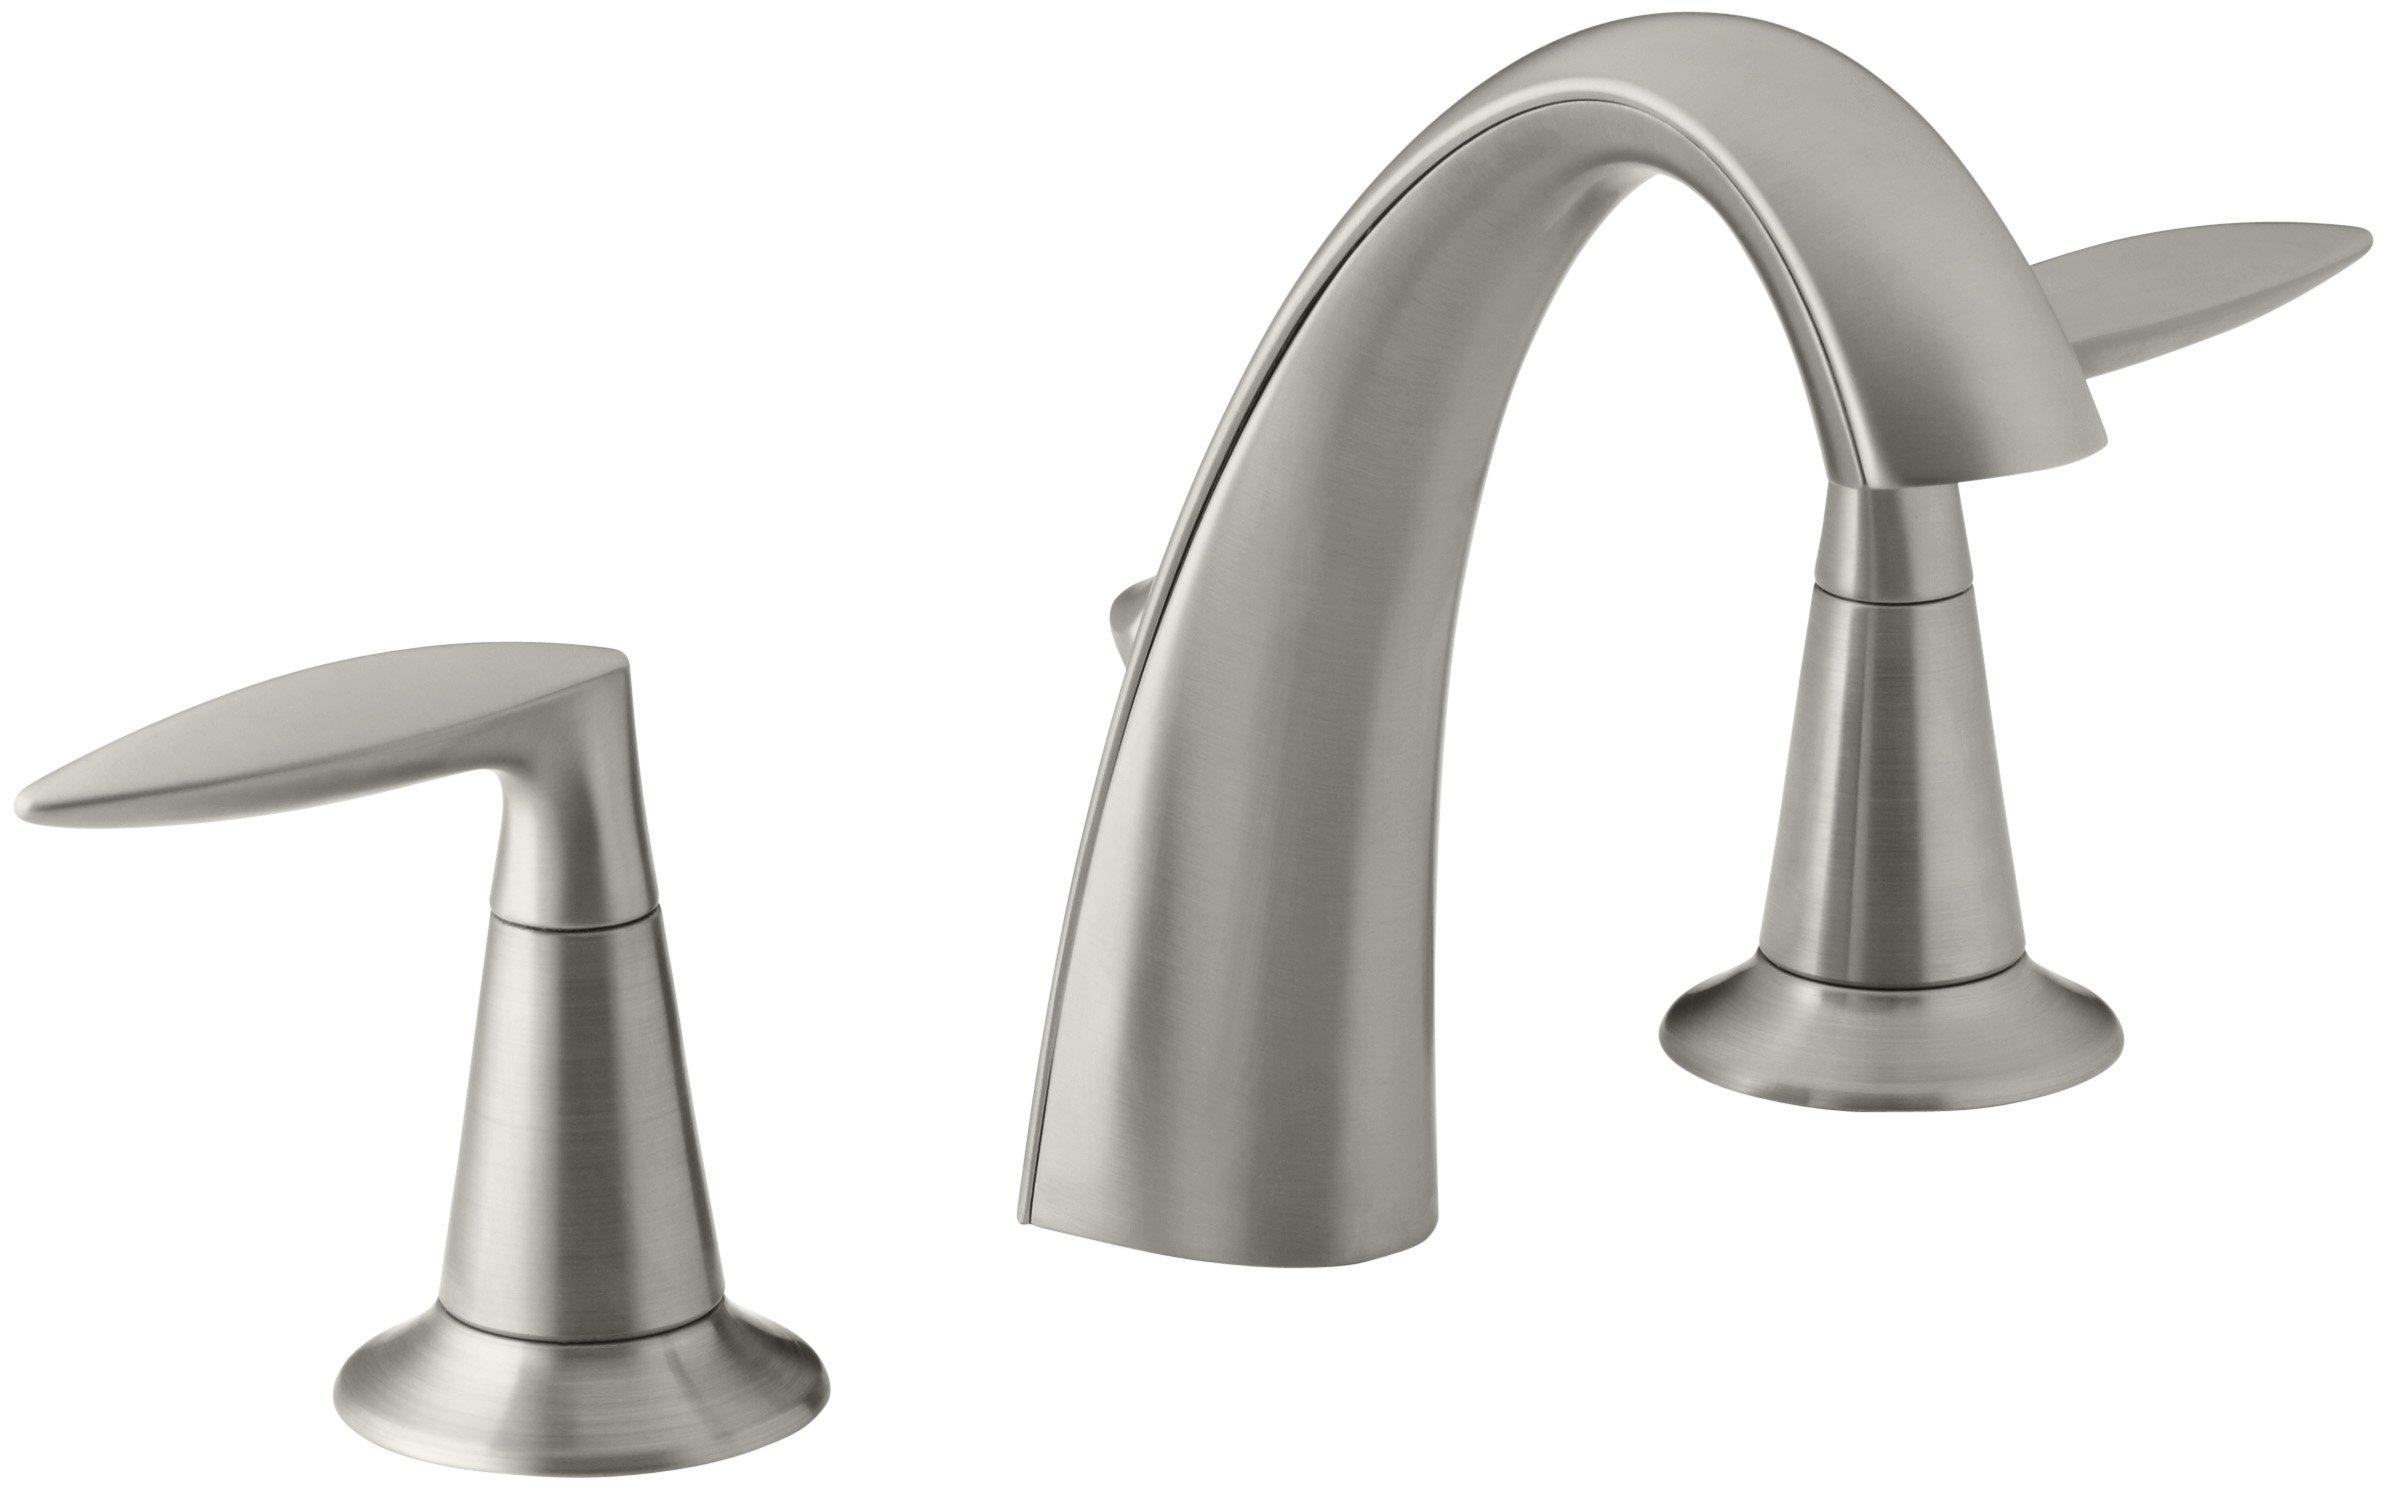 KOHLER K-45102-4-BN Alteo Widespread Lavatory Faucet, Vibrant Brushed Nickel